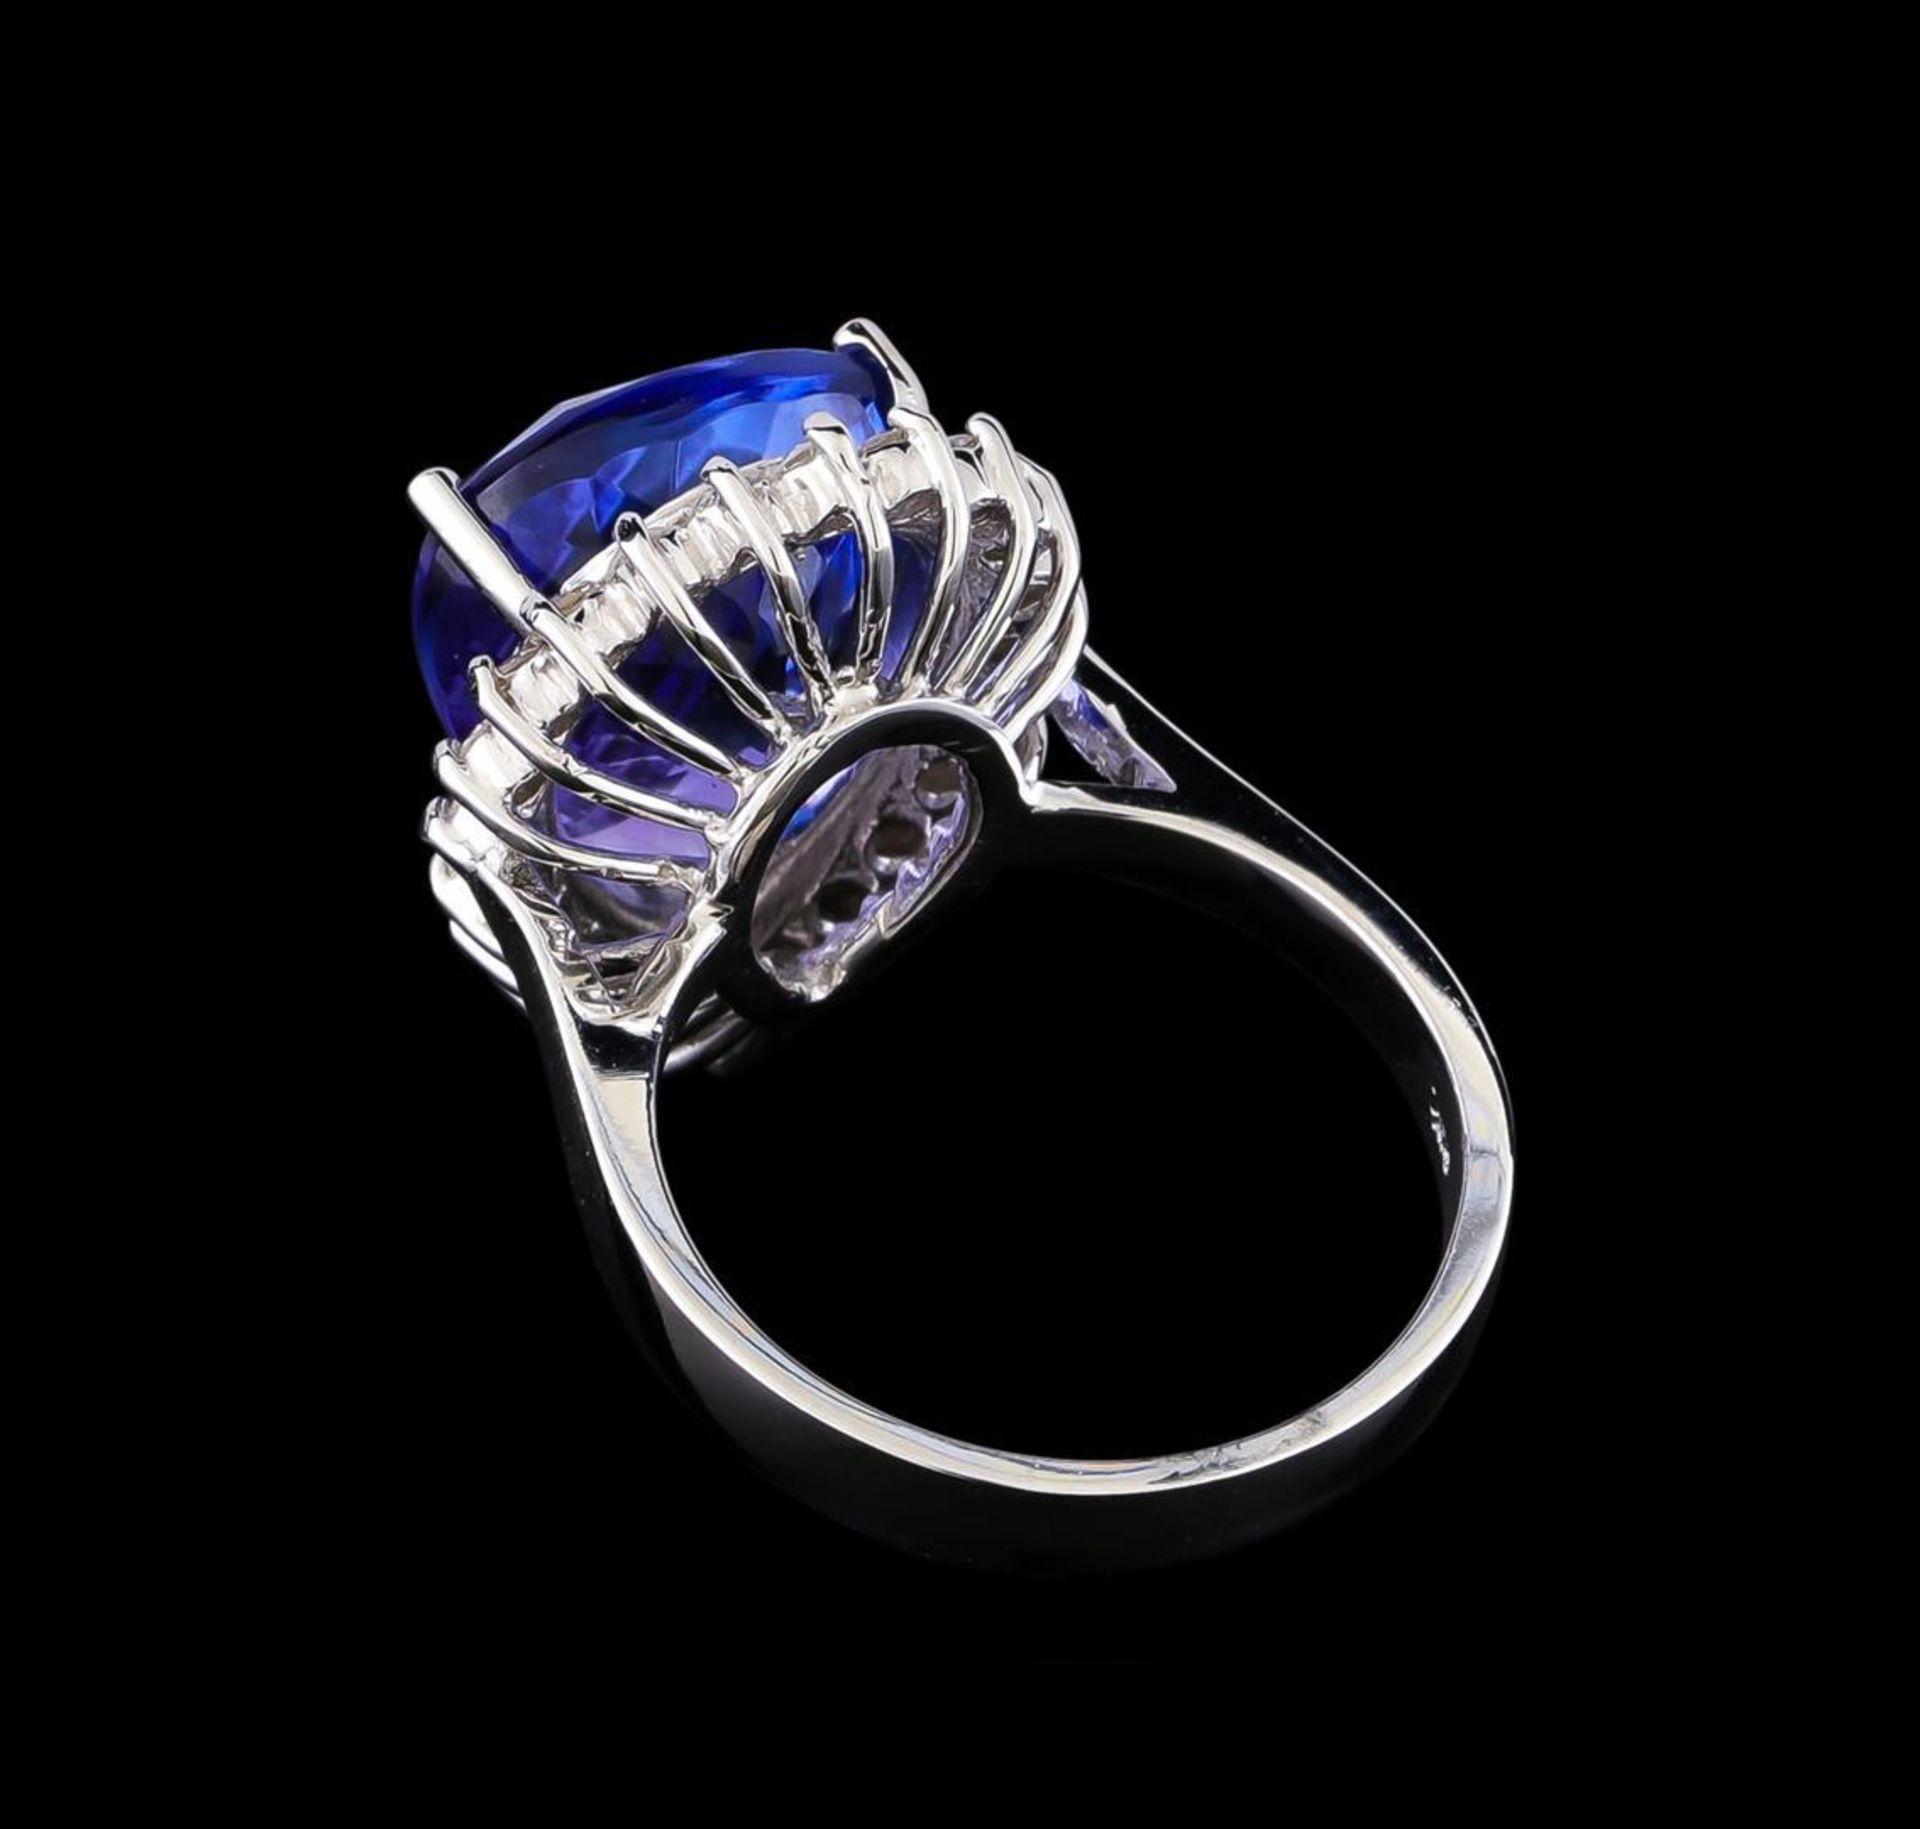 11.38 ctw Tanzanite and Diamond Ring - 14KT White Gold - Image 3 of 5